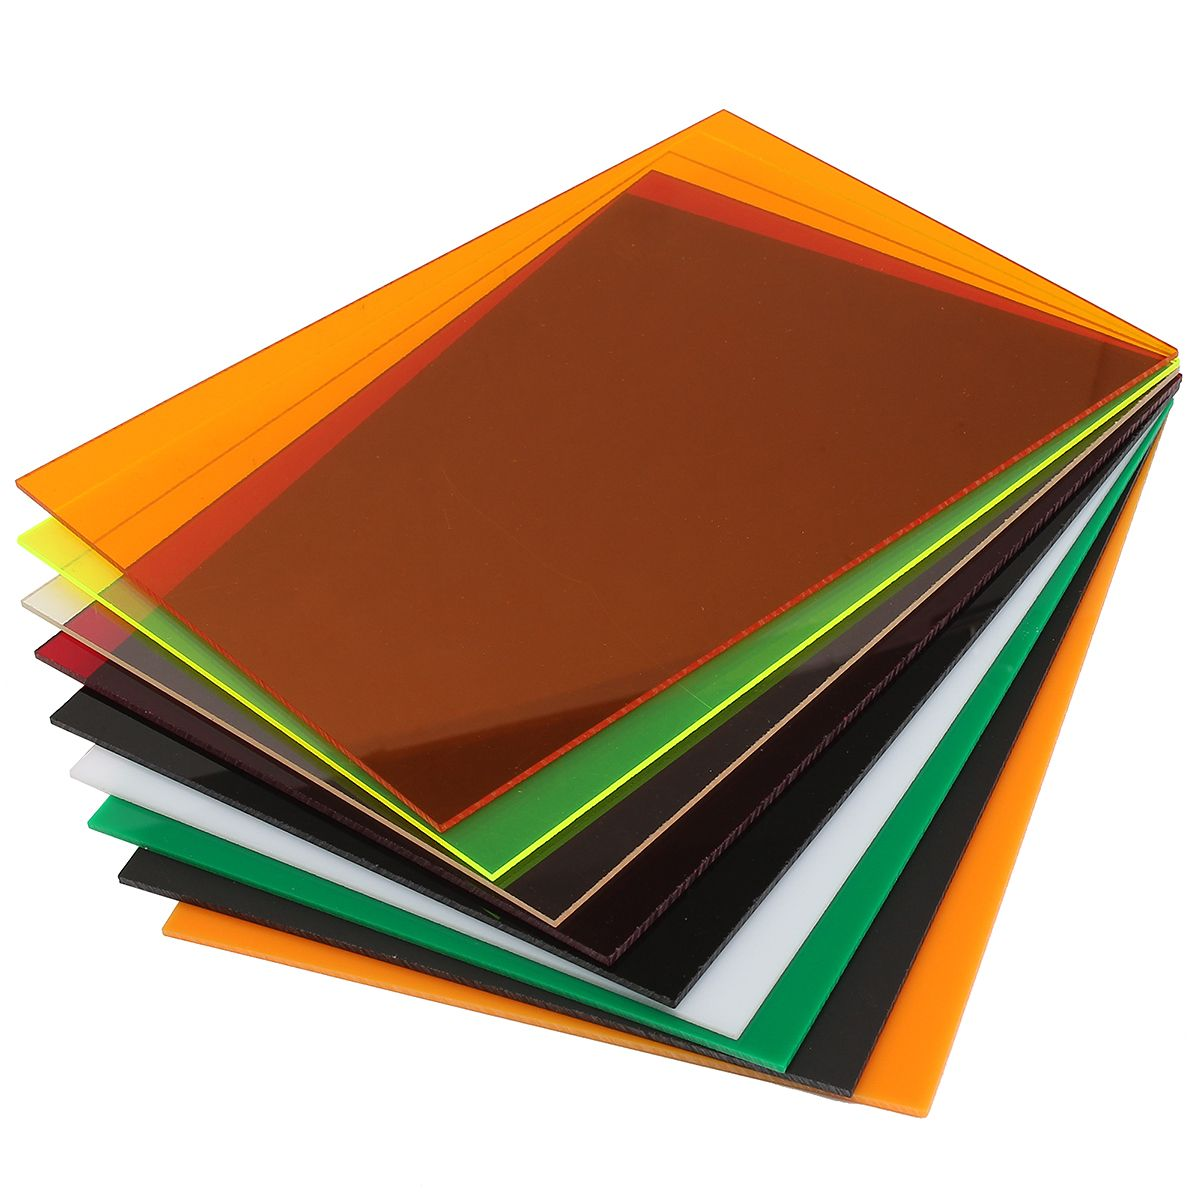 420 594 5 Mm Hoja De Acrilico Talla Tallar Placa De 10 Colores